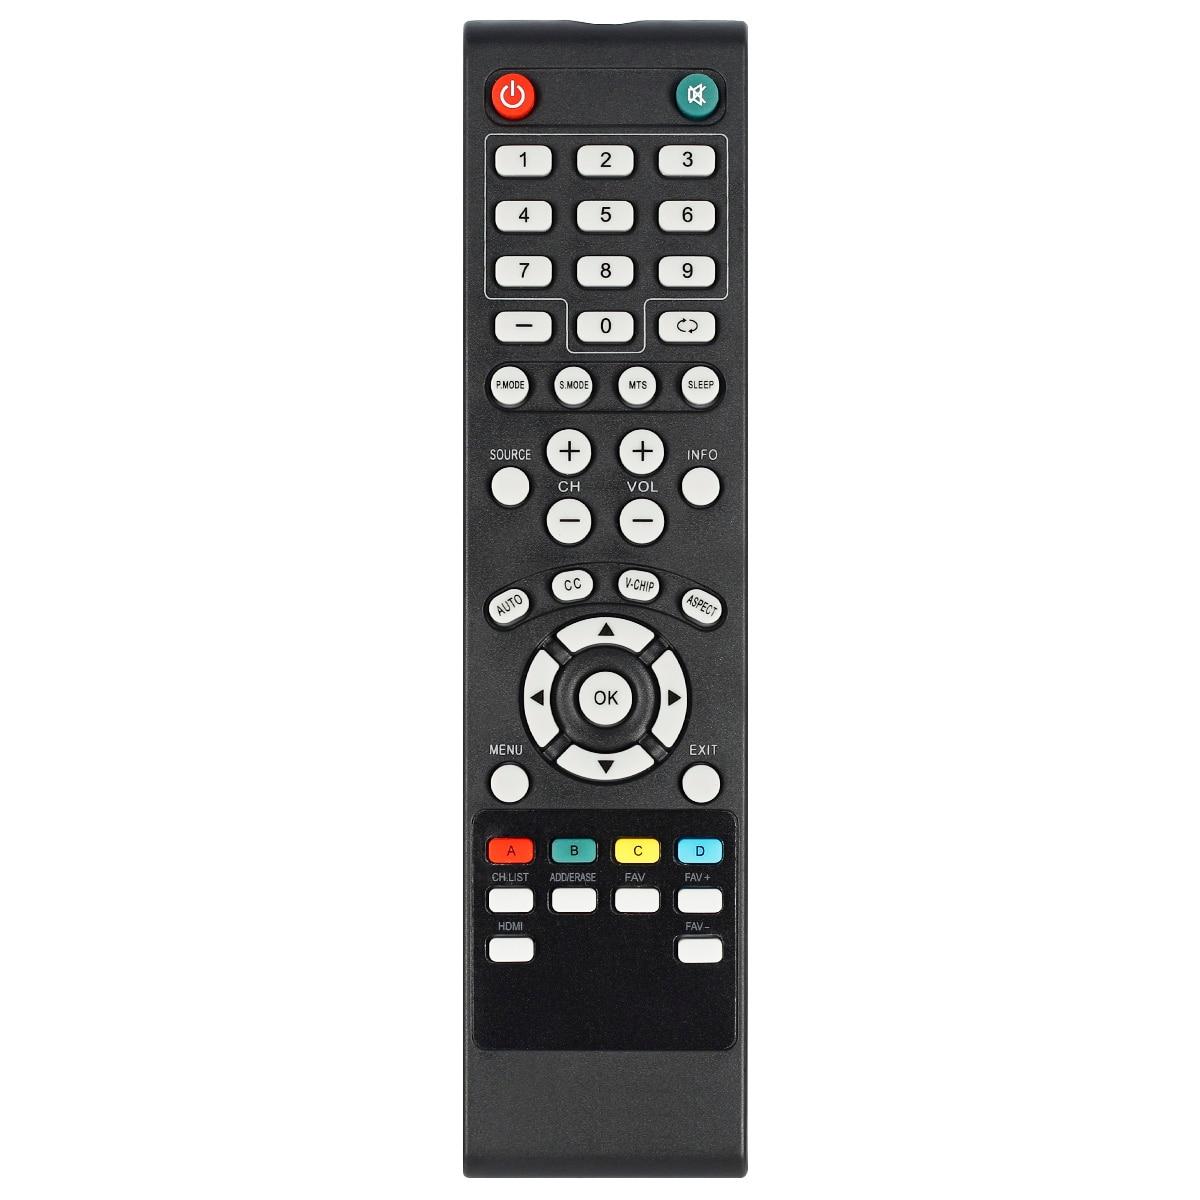 Controle remoto para sylvania tv controle remoto